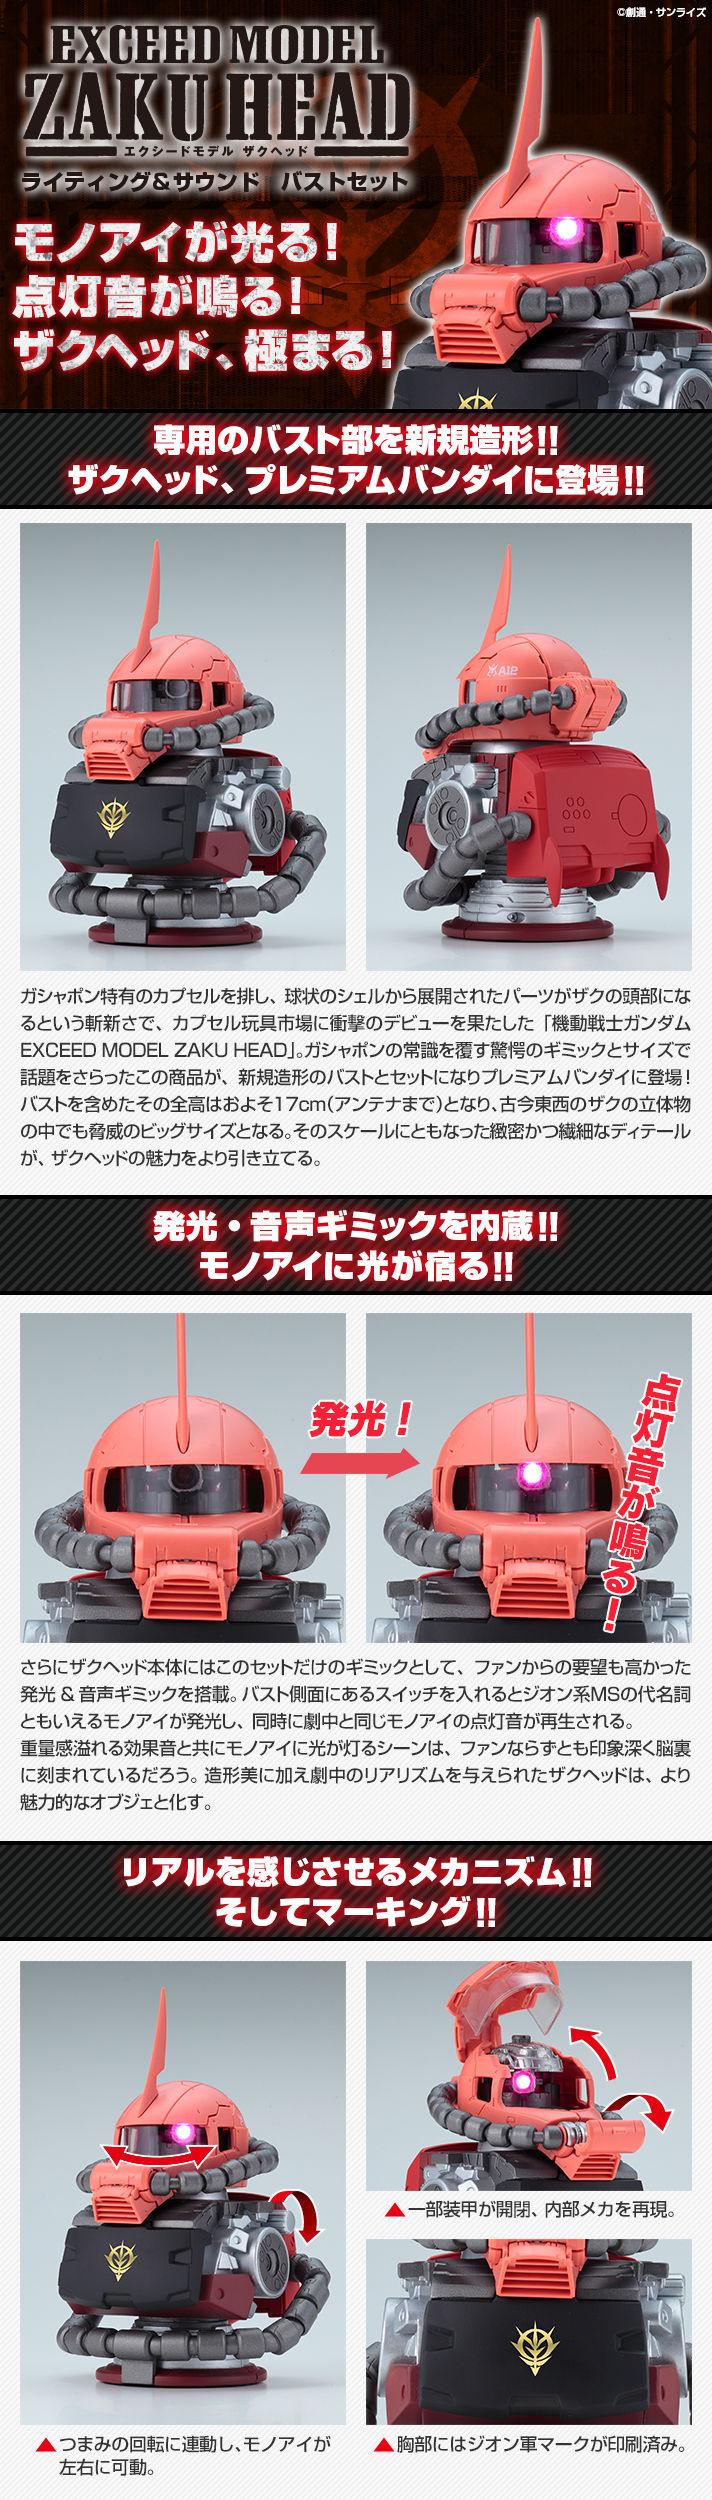 EXCEED MODEL ZAKU HEAD ライティング&サウンドバストセット シャア専用ザクII